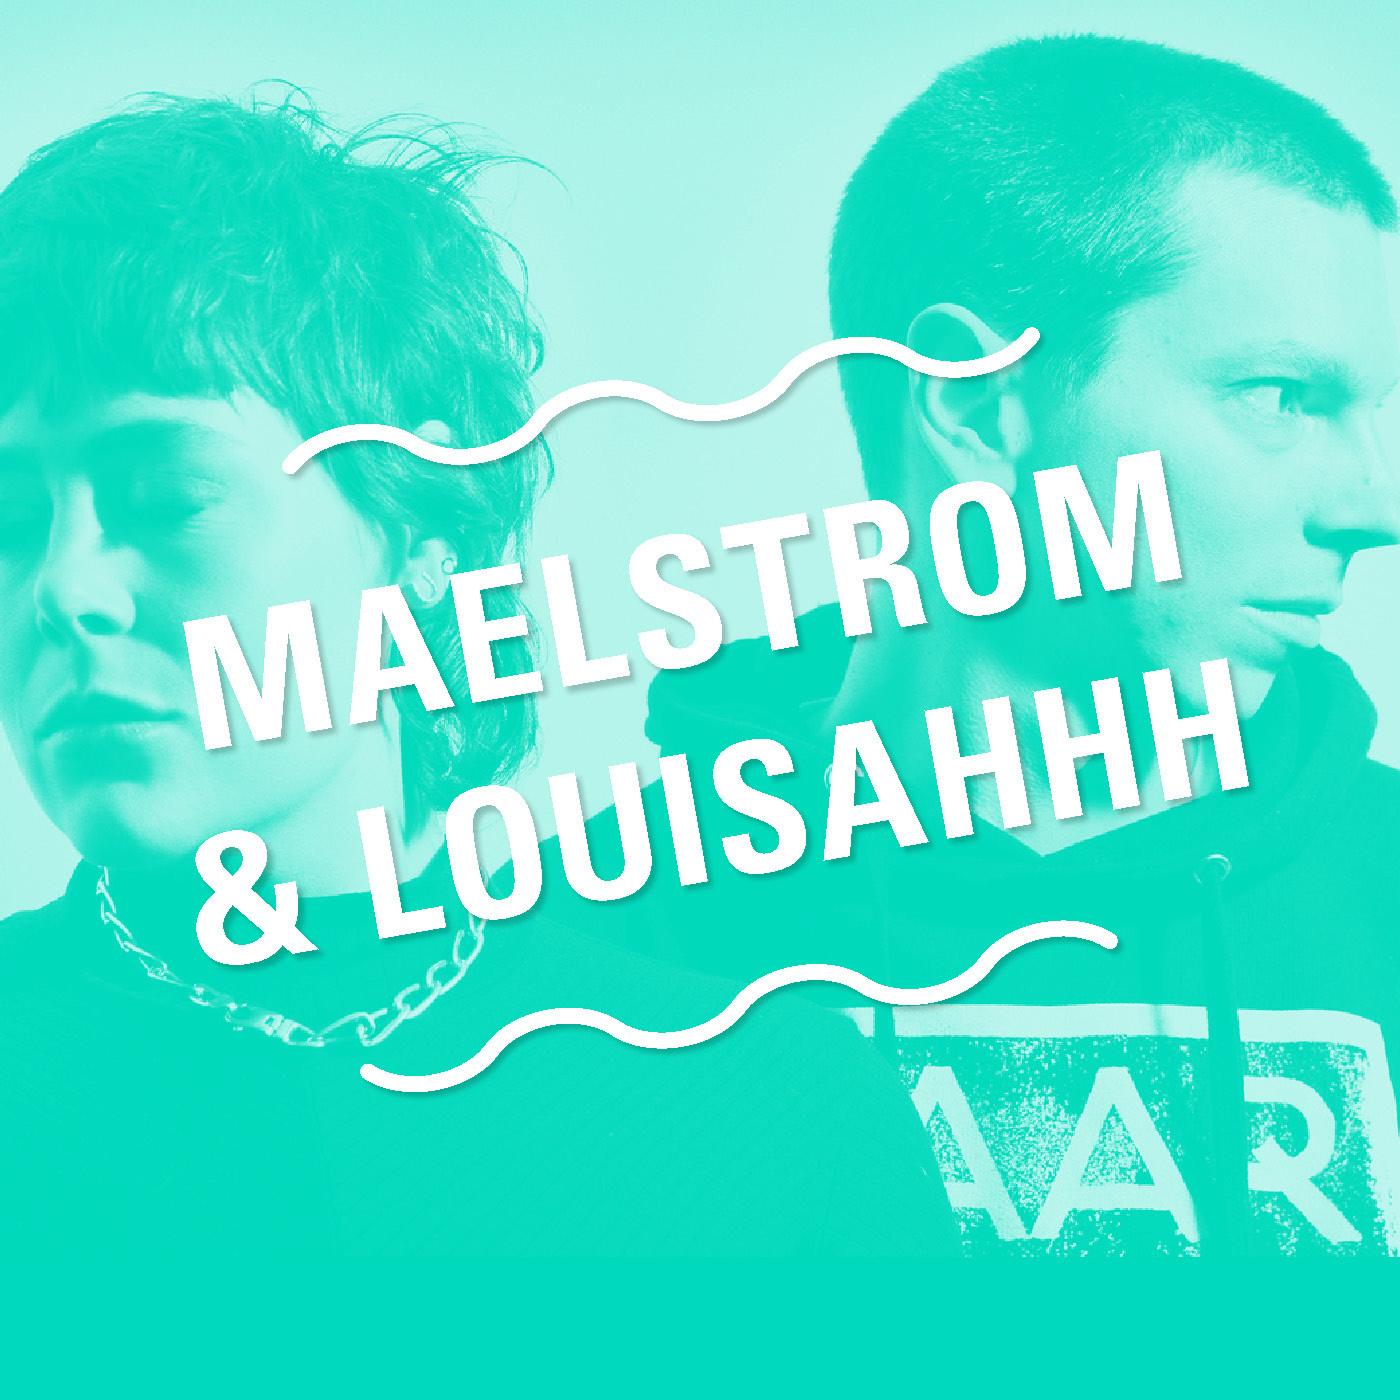 #03 Maelstrom & Louisahhh